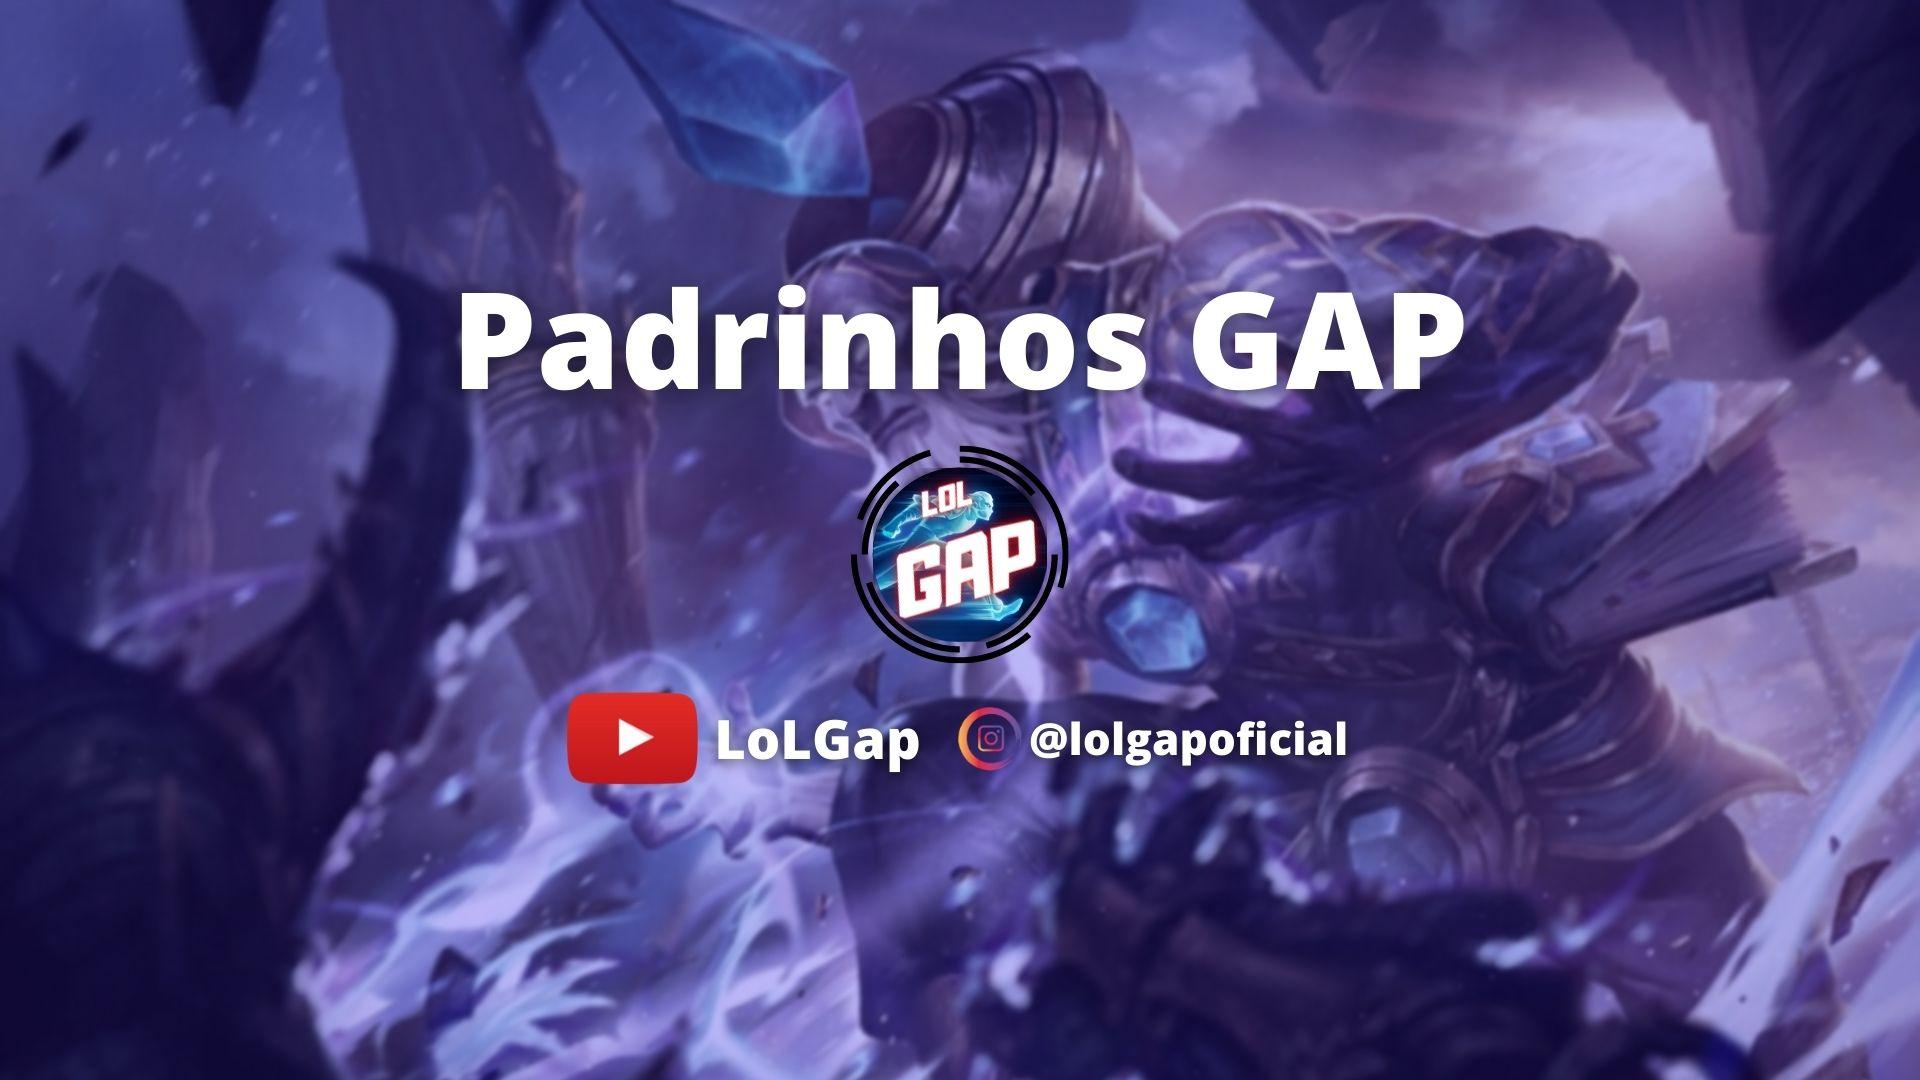 Padrinhos gap  2